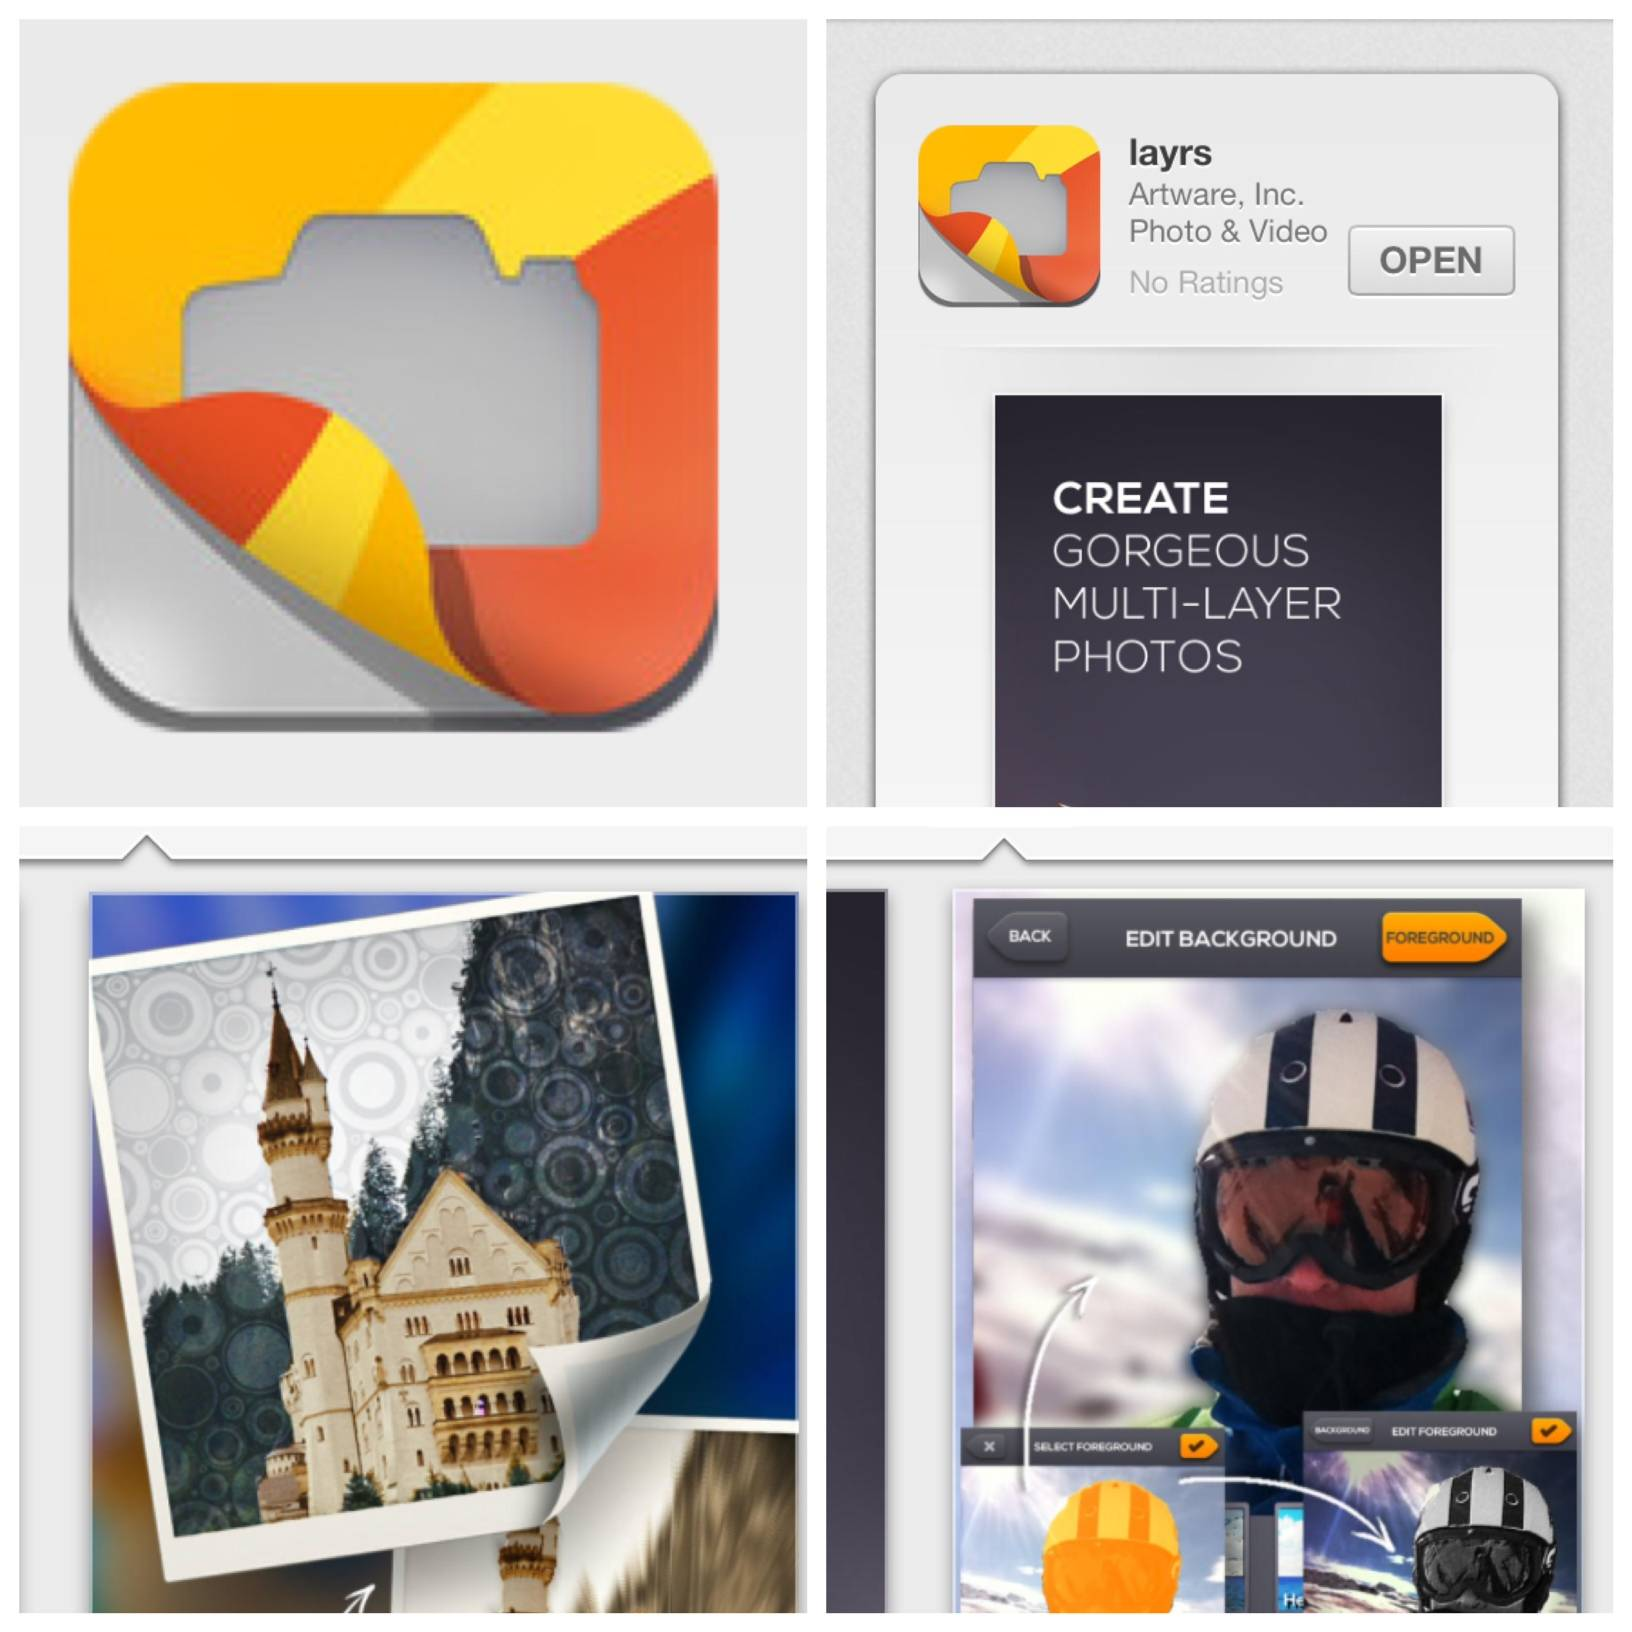 Layrs, a true multi-layer photo editing app!